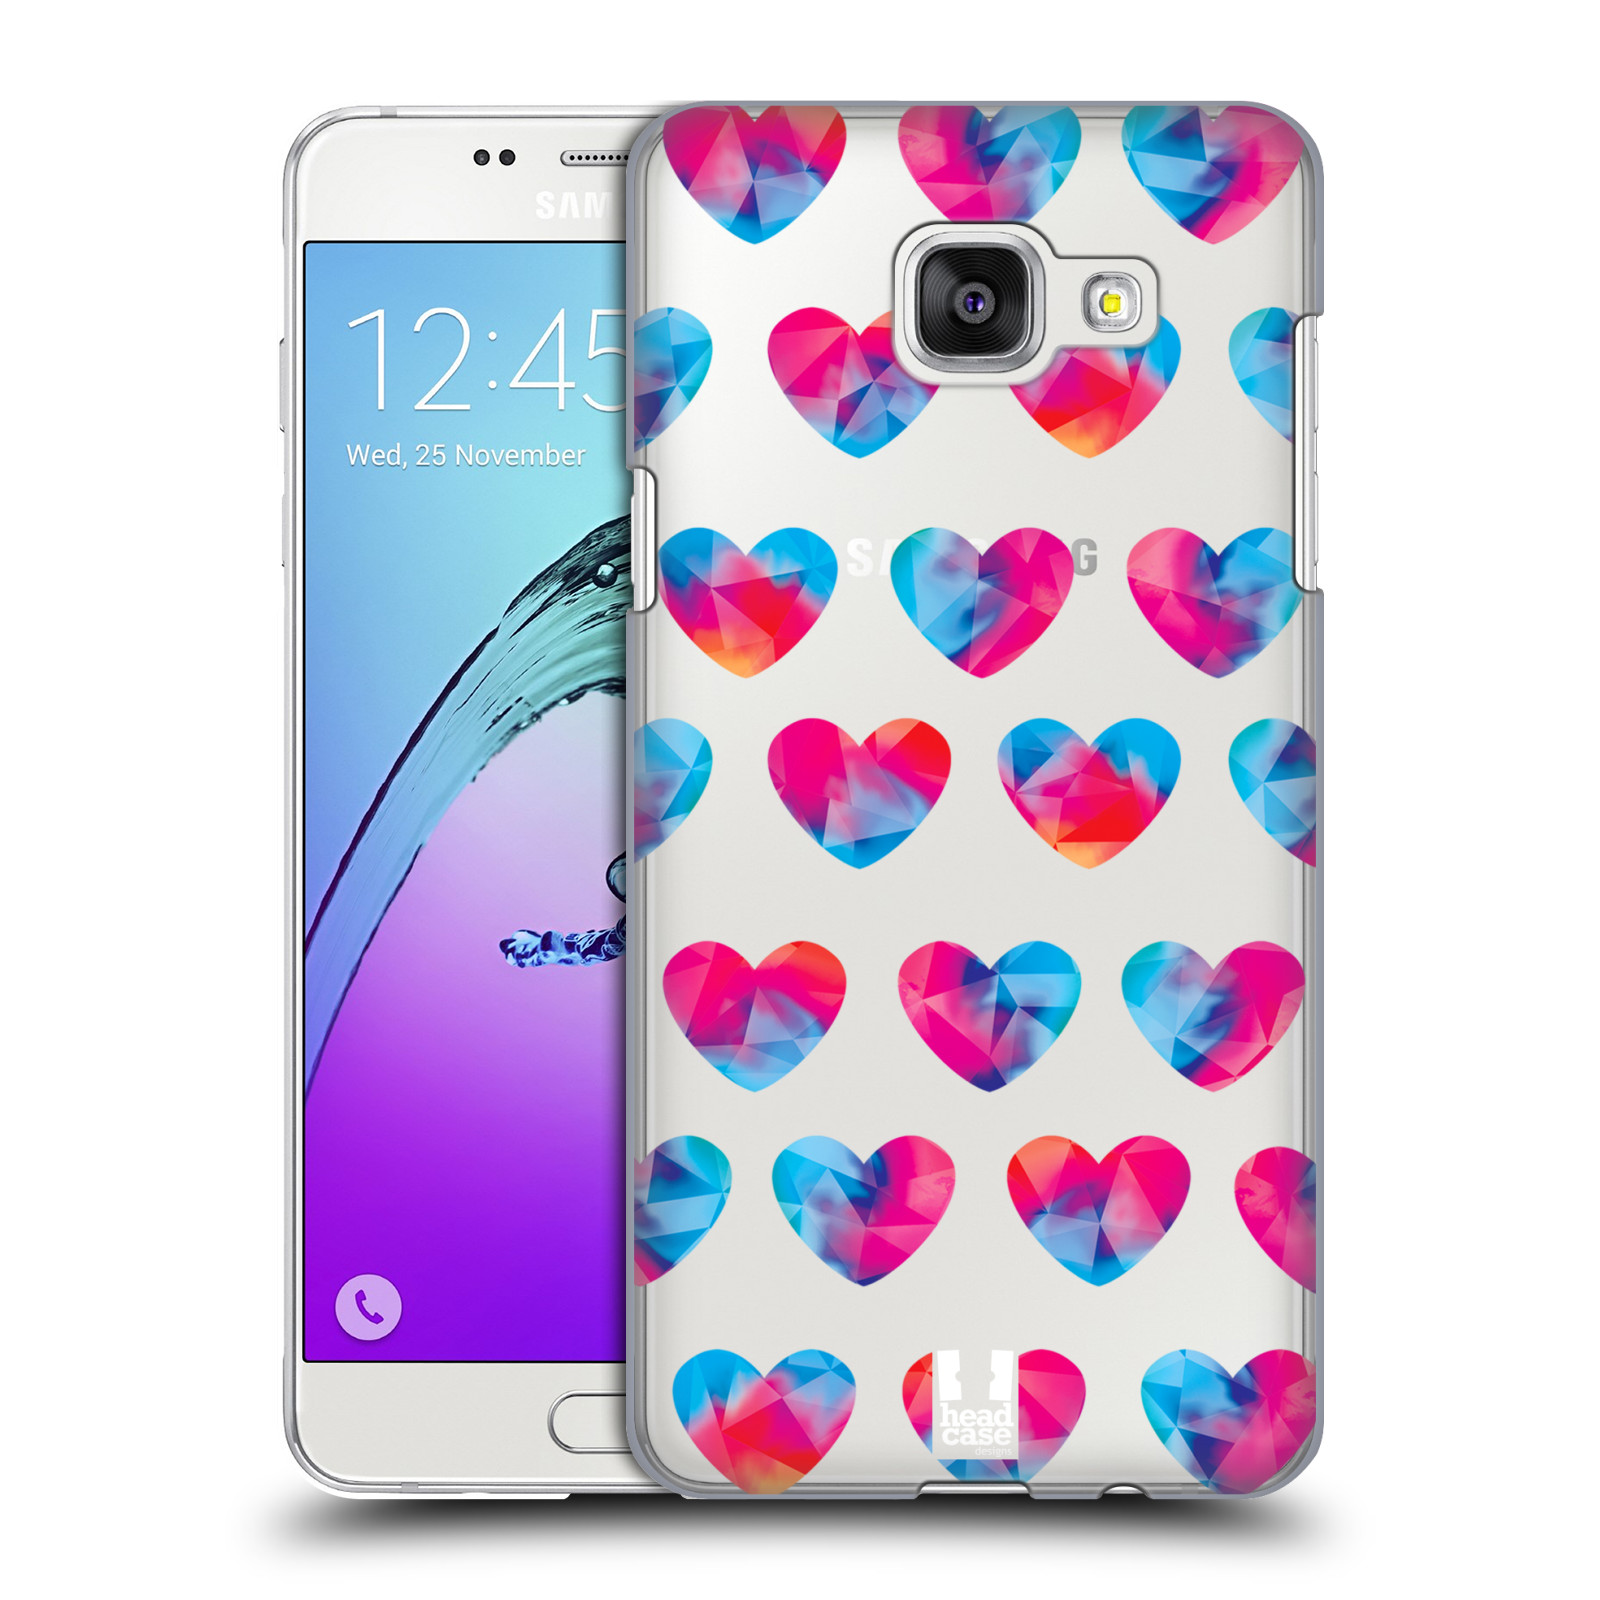 Plastové pouzdro na mobil Samsung Galaxy A5 (2016) - Head Case - Srdíčka hrající barvami